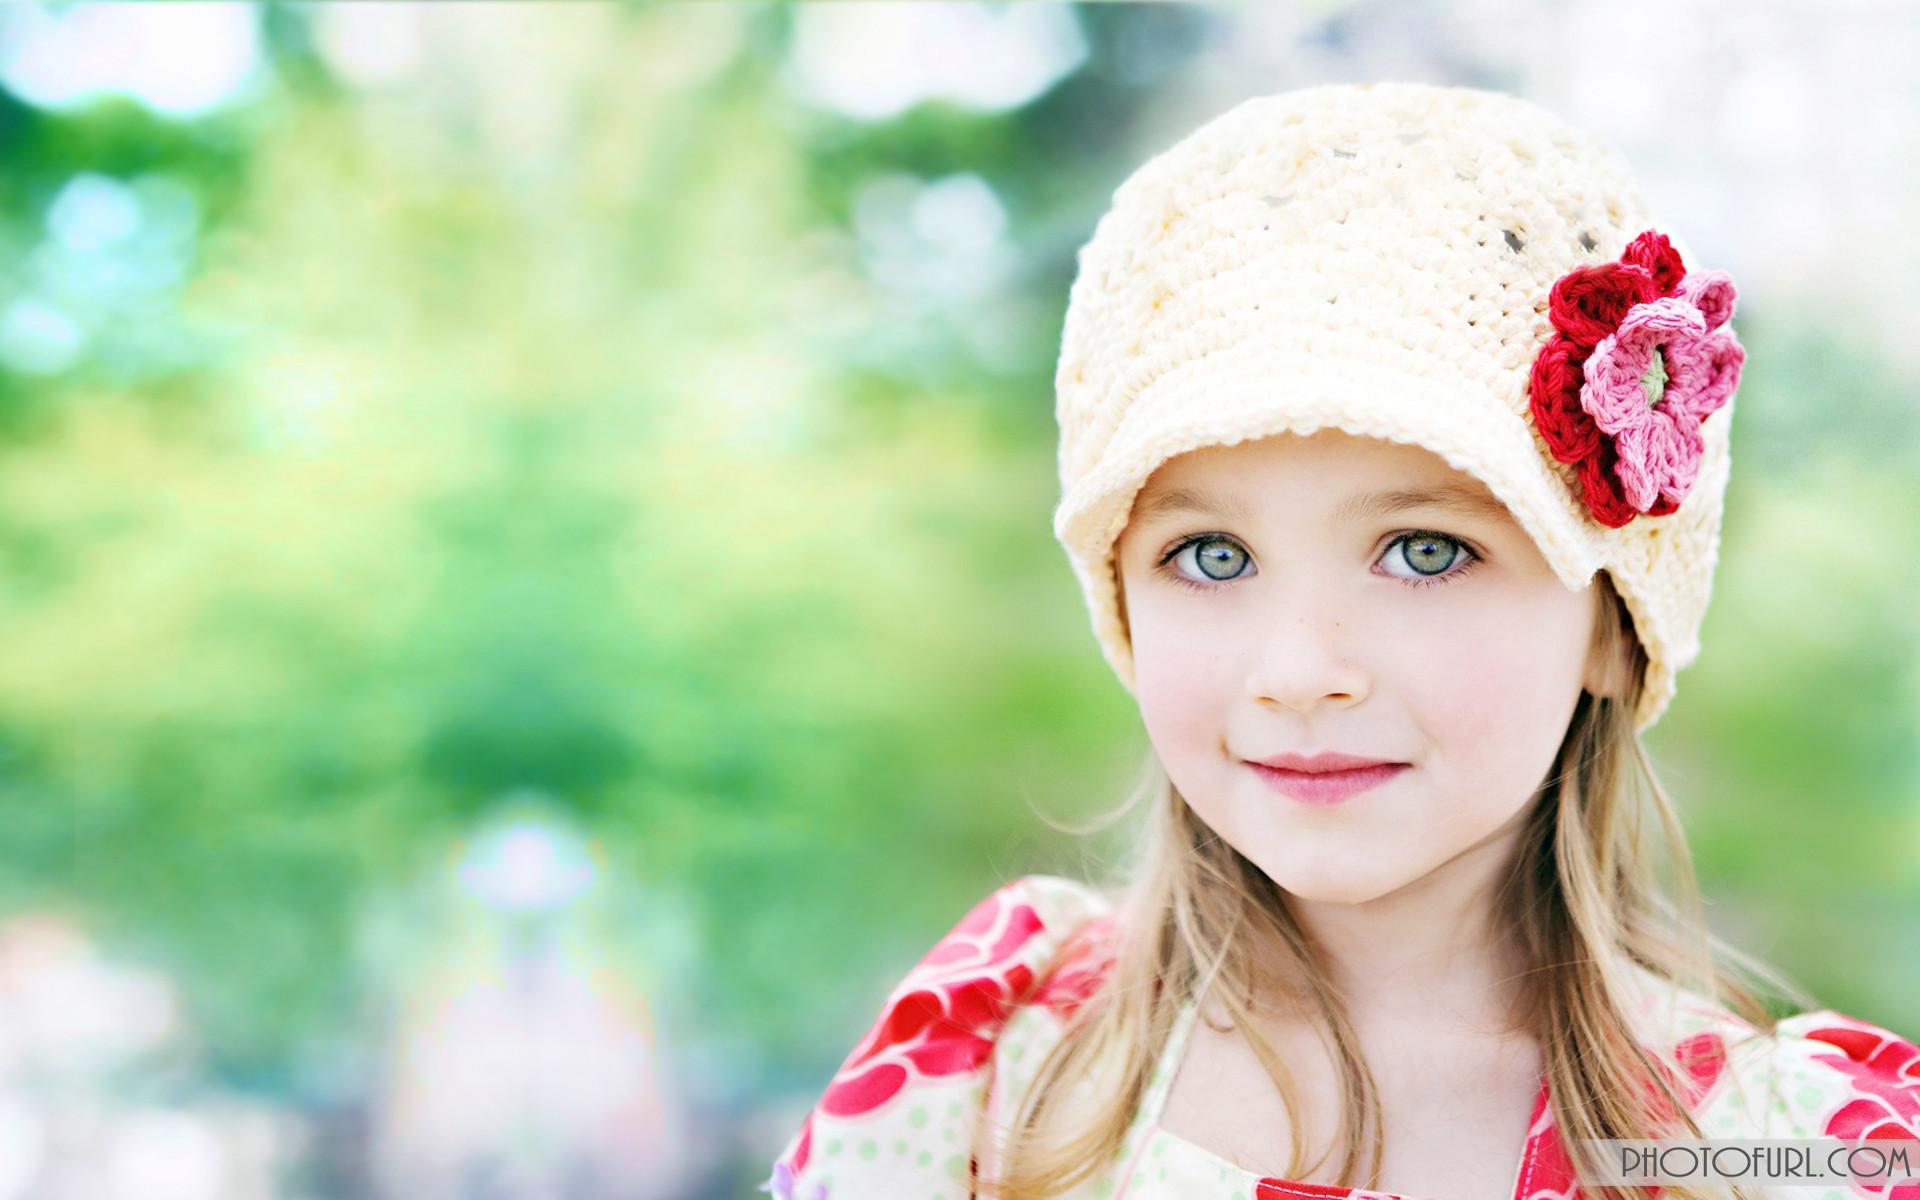 "17 Best ideas about Cute Baby Girl Wallpaper on Pinterest | Kelly "",""pu"